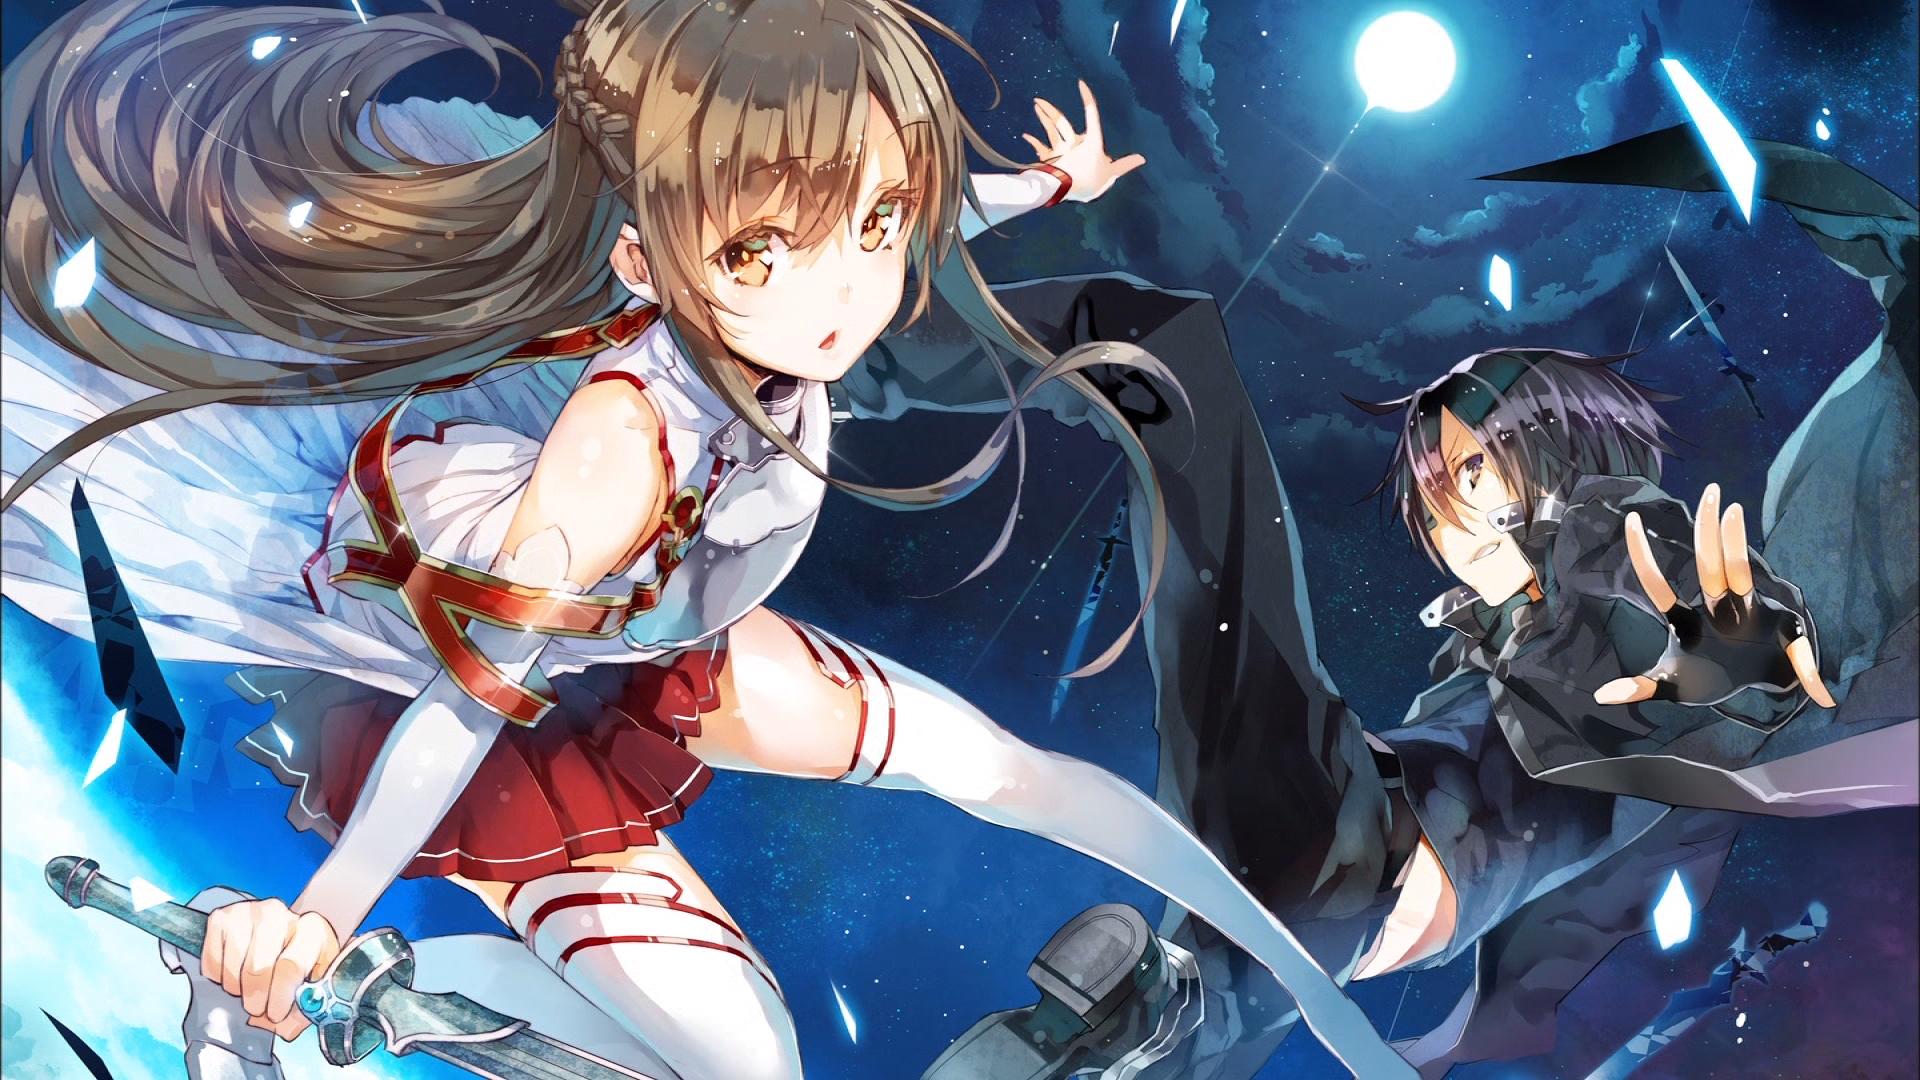 Sao Fanart Sword Art Online Rp Land Wallpaper 37675420 Fanpop